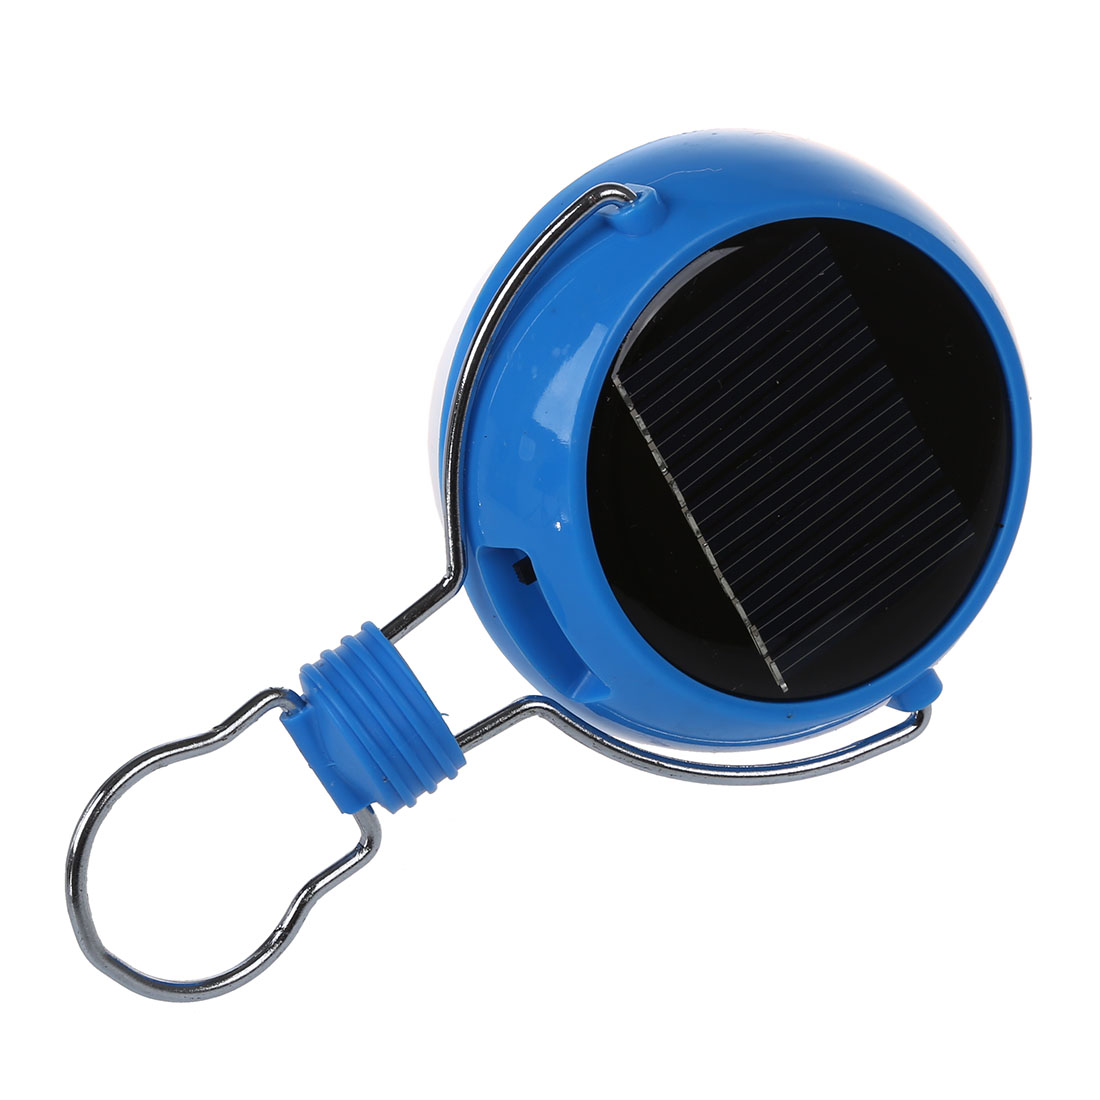 Portable White 7 LED Solar Power Camping Hiking Fishing Tent Lantern Light Lamp